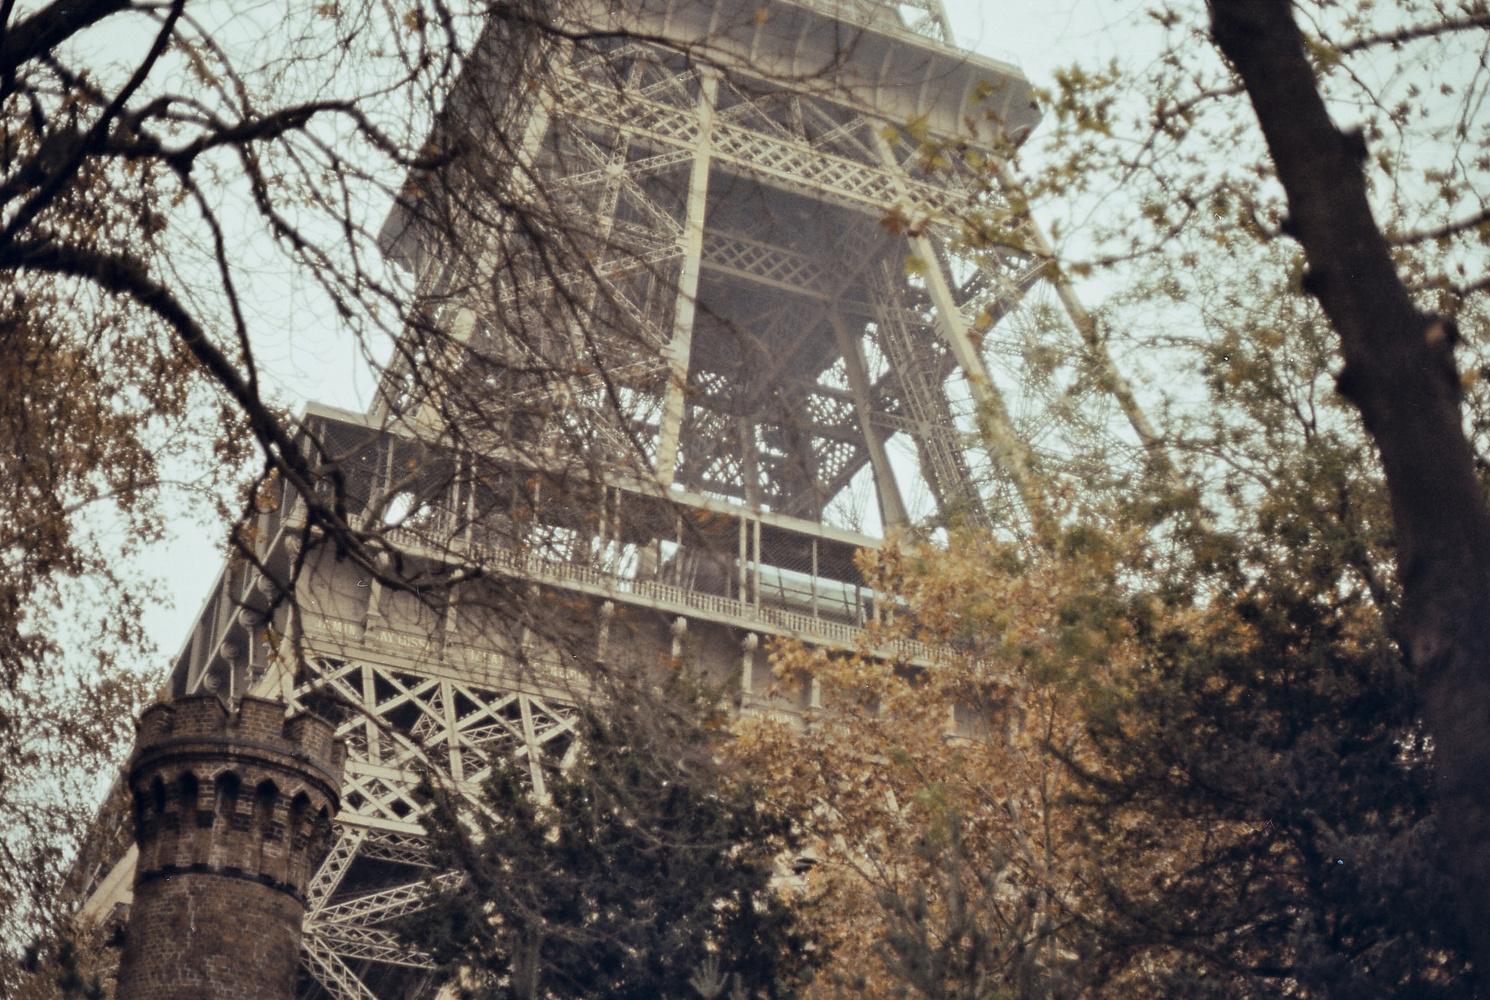 Eifel Tower through trees by Joe Irving